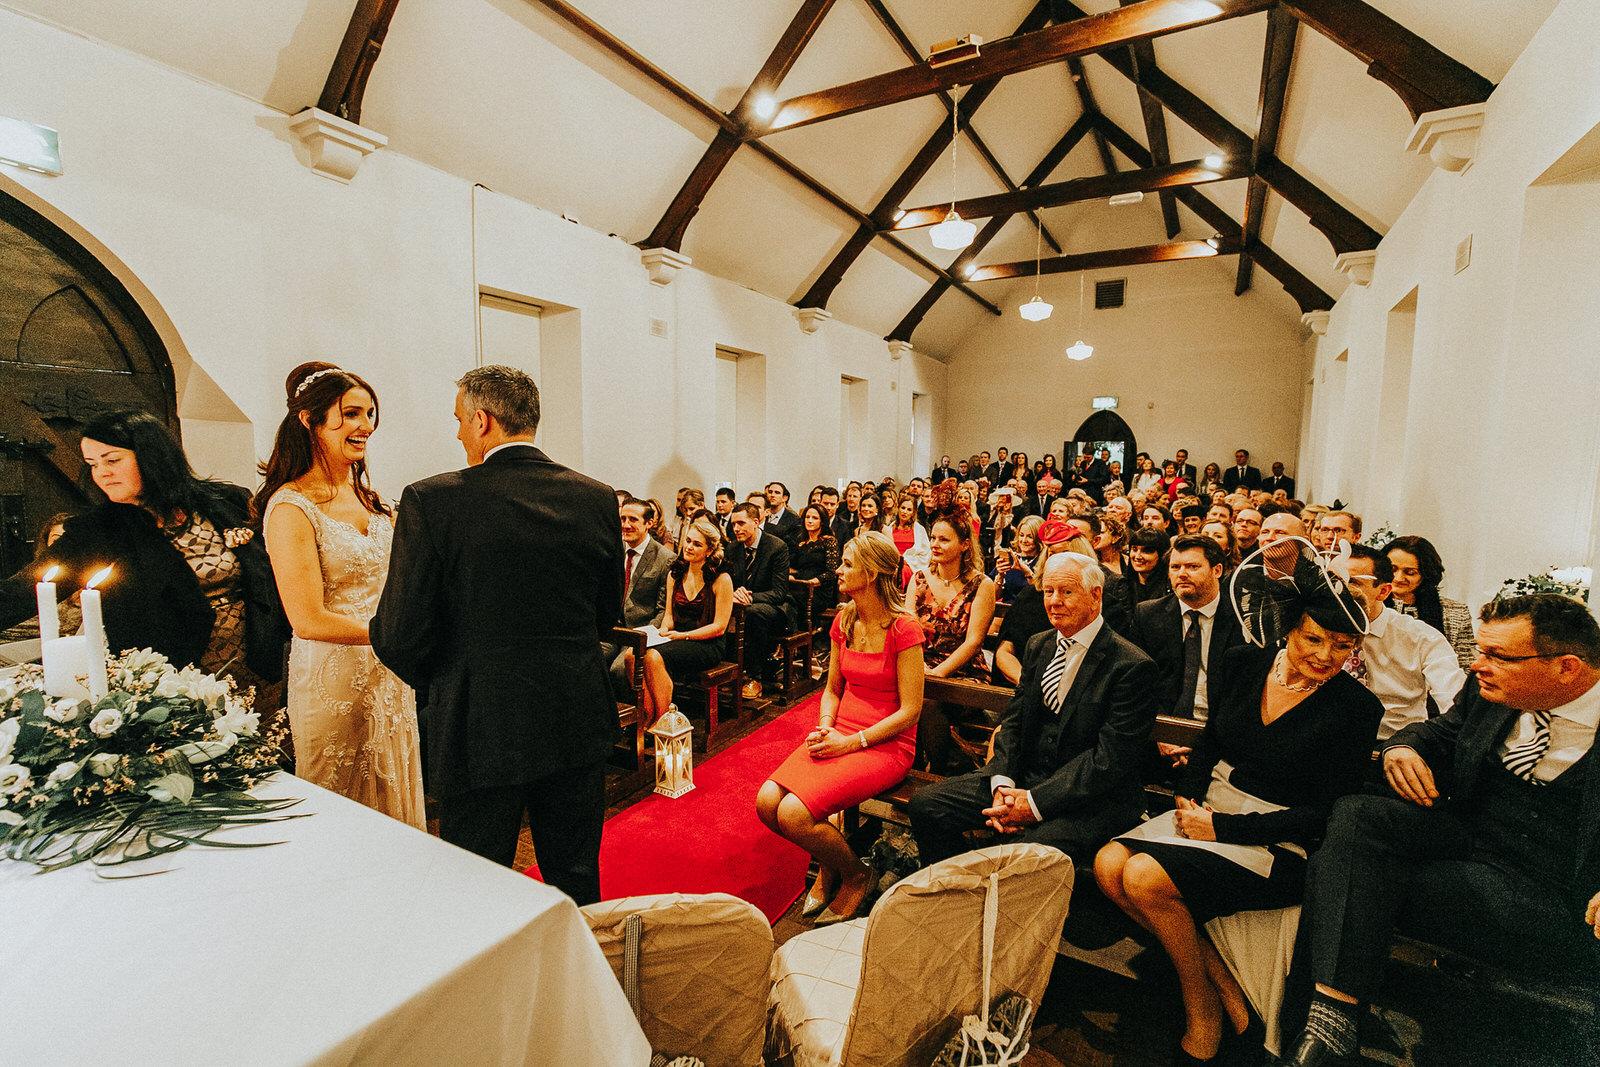 Roger_Kenny_wedding_photographer_Brooklodge__659.jpg